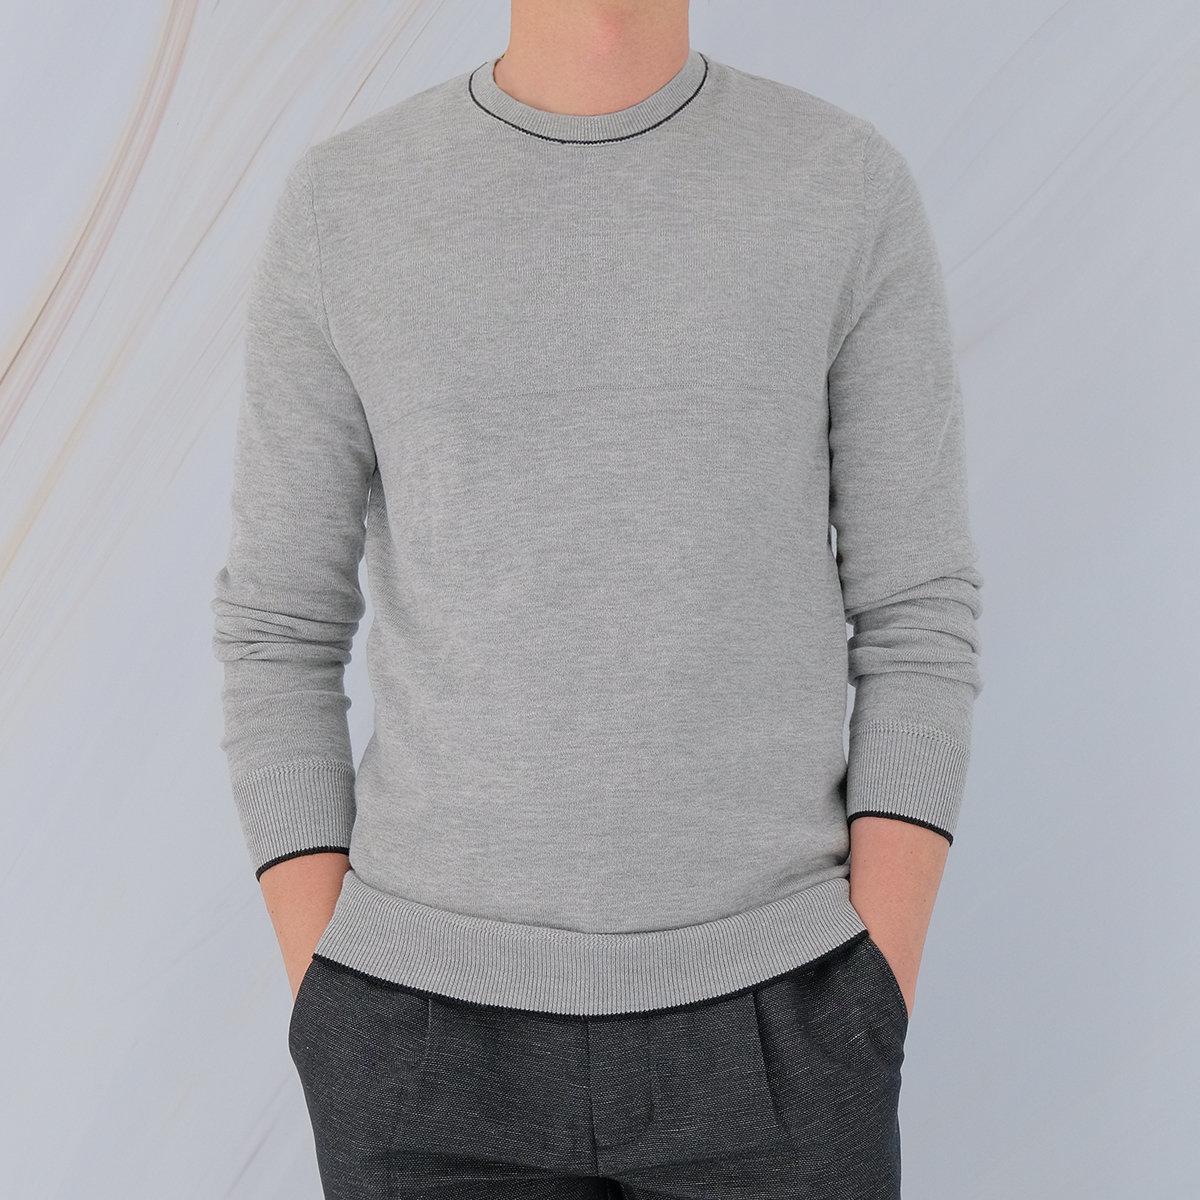 Men's Cotton Sweater (Black)